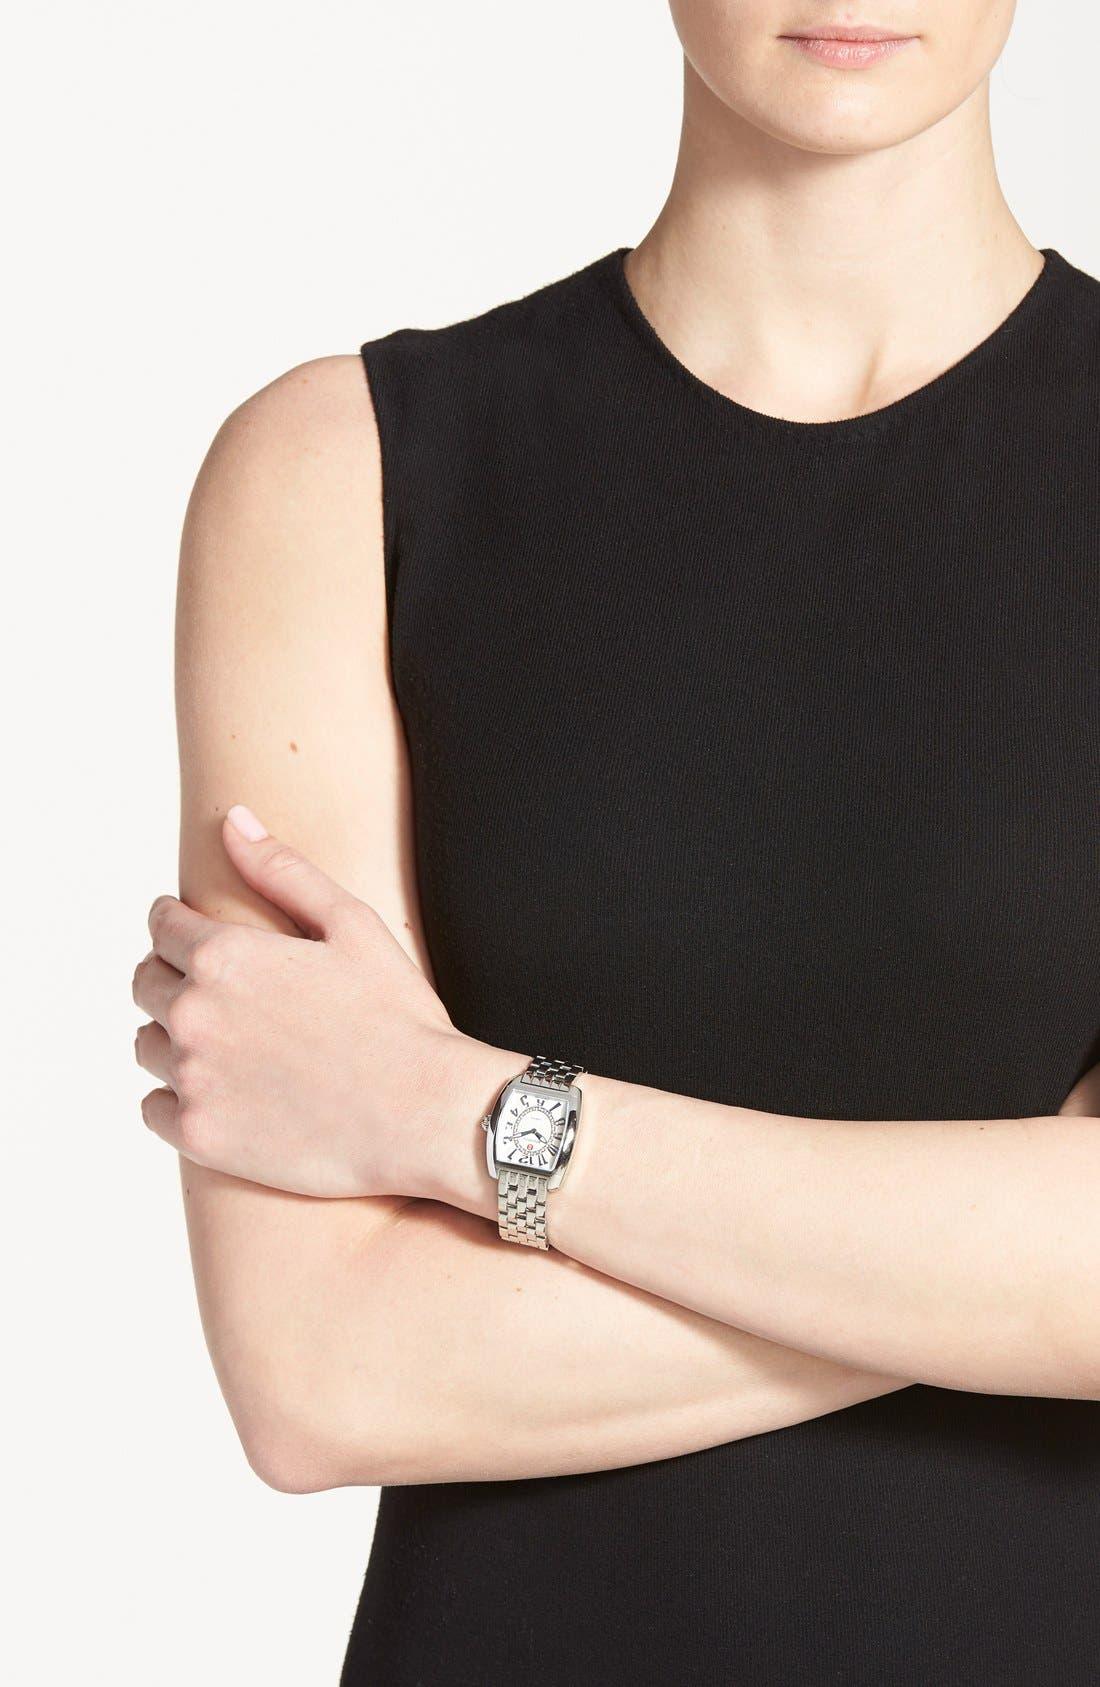 Urban Mini Diamond Dial Watch Case, 29mm x 30mm,                             Alternate thumbnail 3, color,                             SILVER/ SILVER